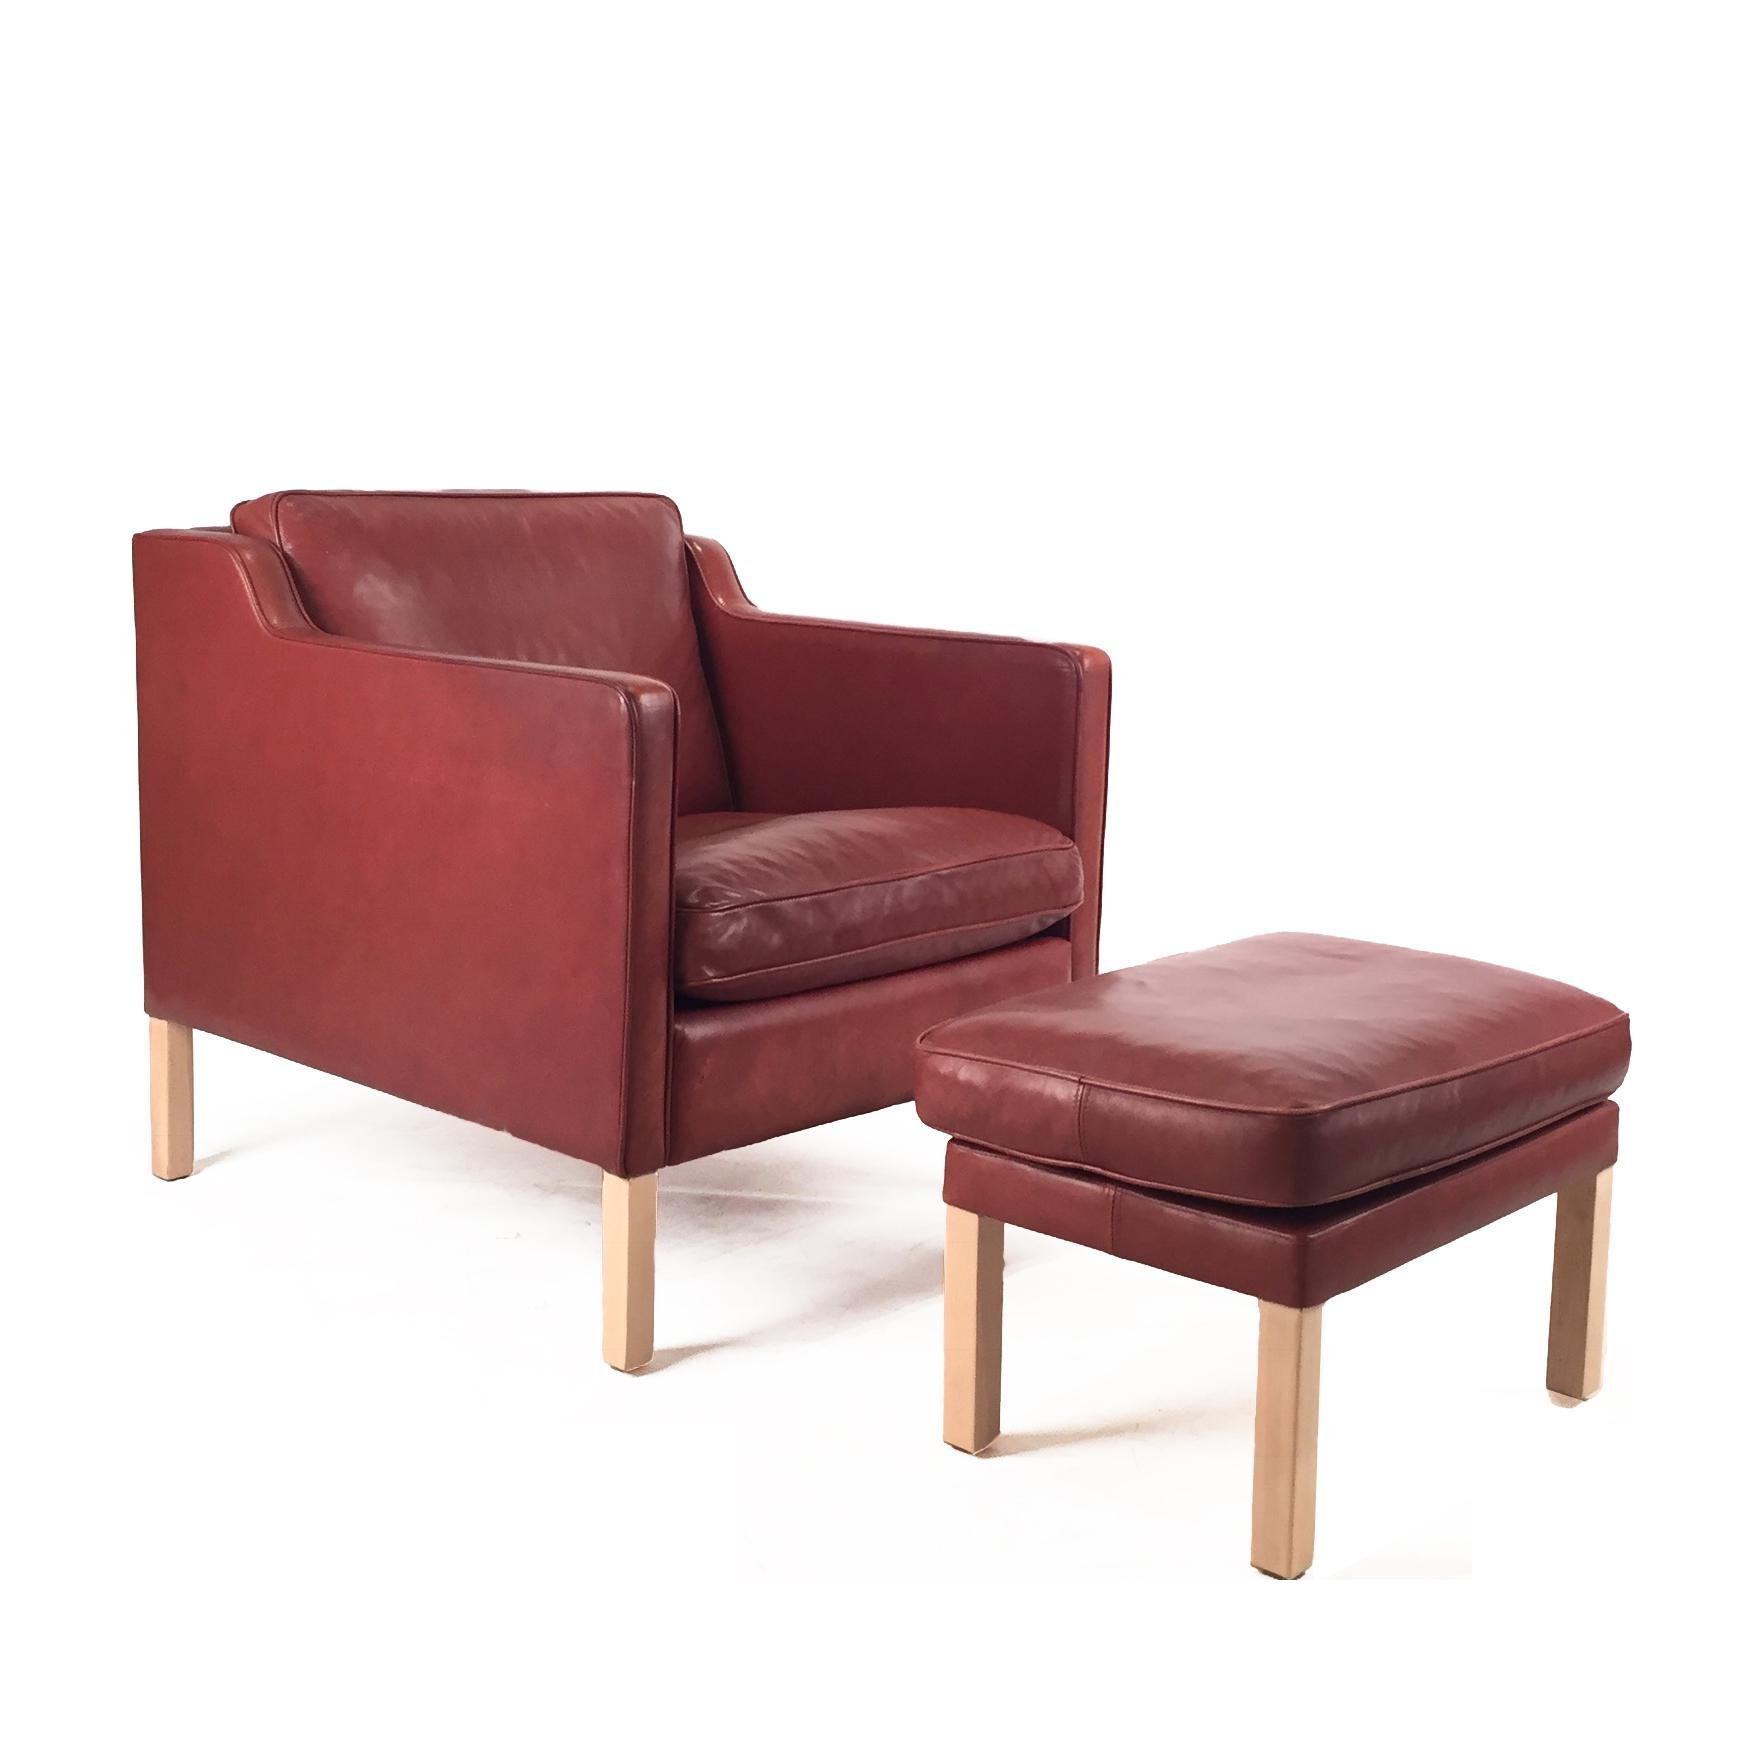 1960s Danish Modern Brown Leather Chair U0026 Ottoman